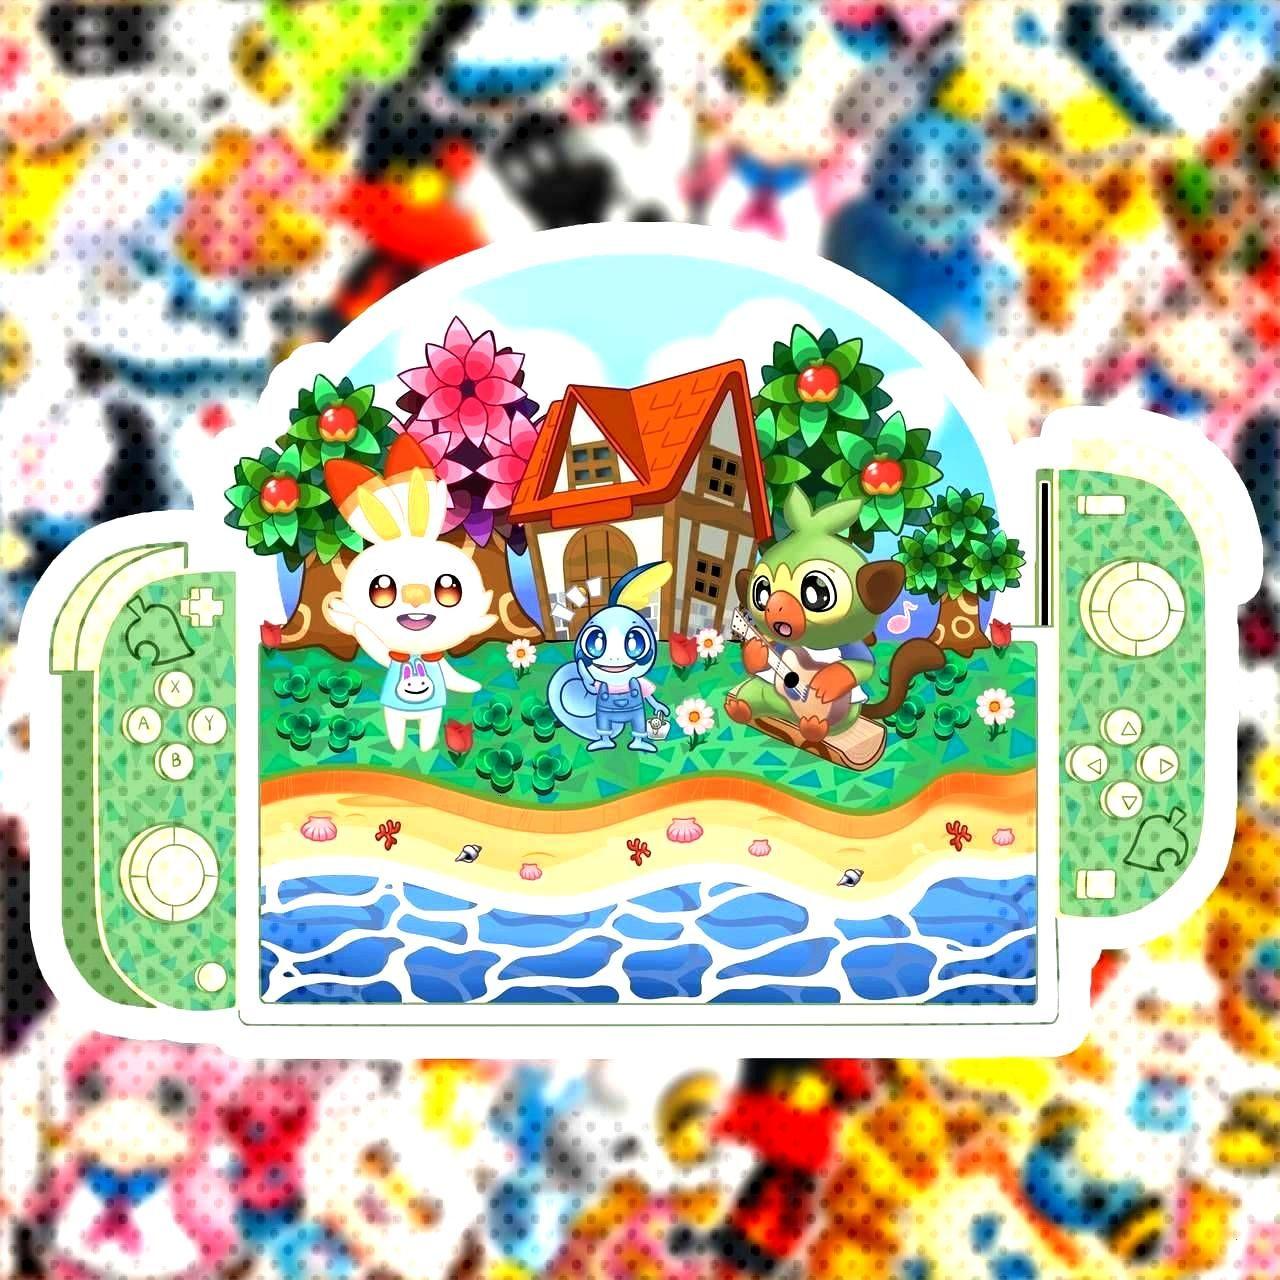 Pokemon X Animal Crossing Stickers made by BiyuDraws -